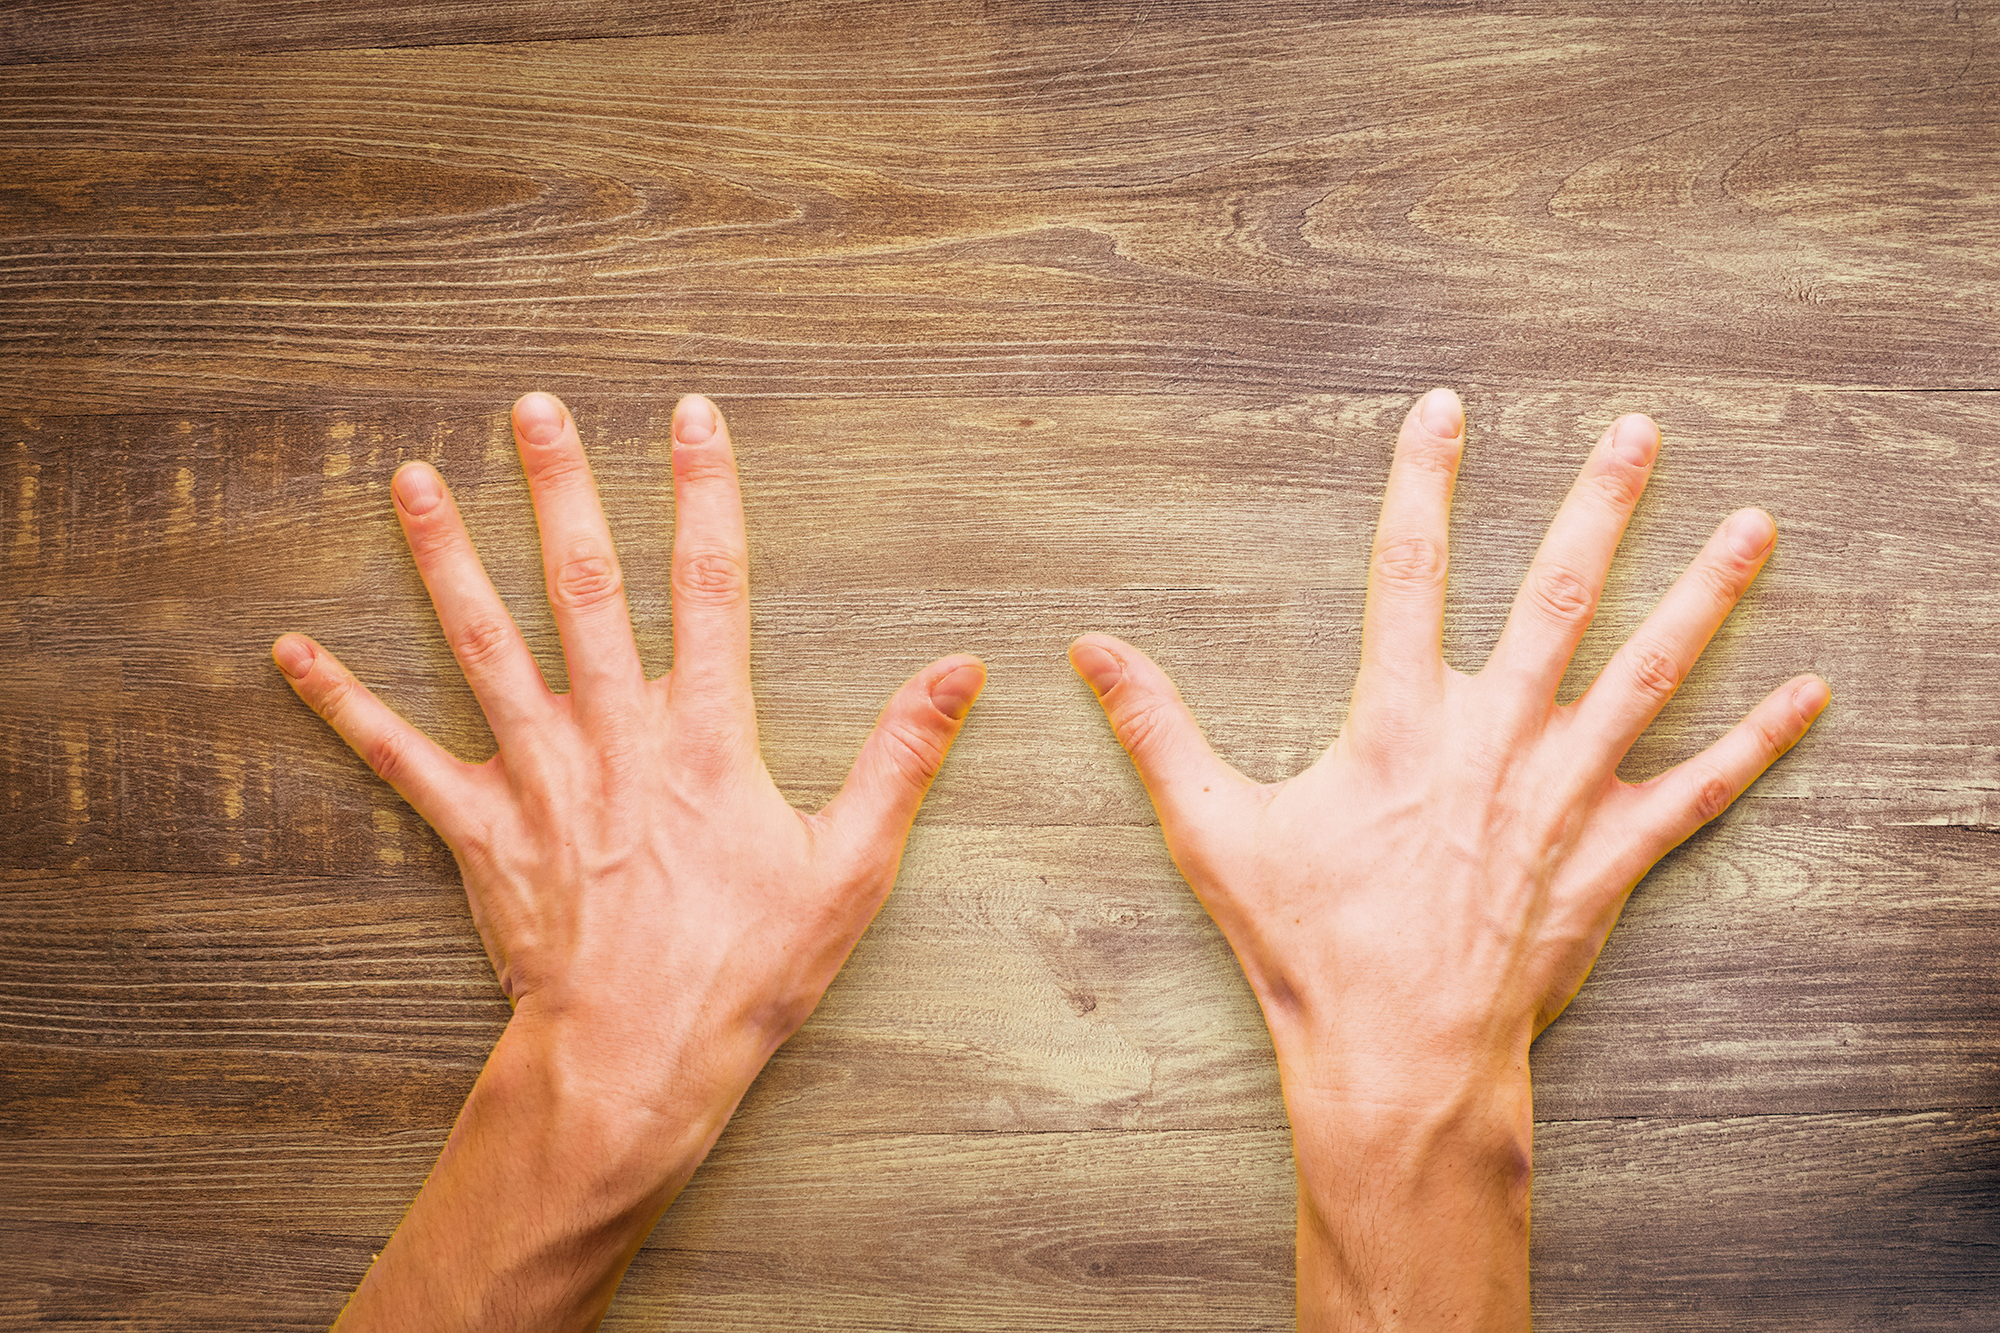 Tipp #2 bei Fingerarthrose: Finger dehnen